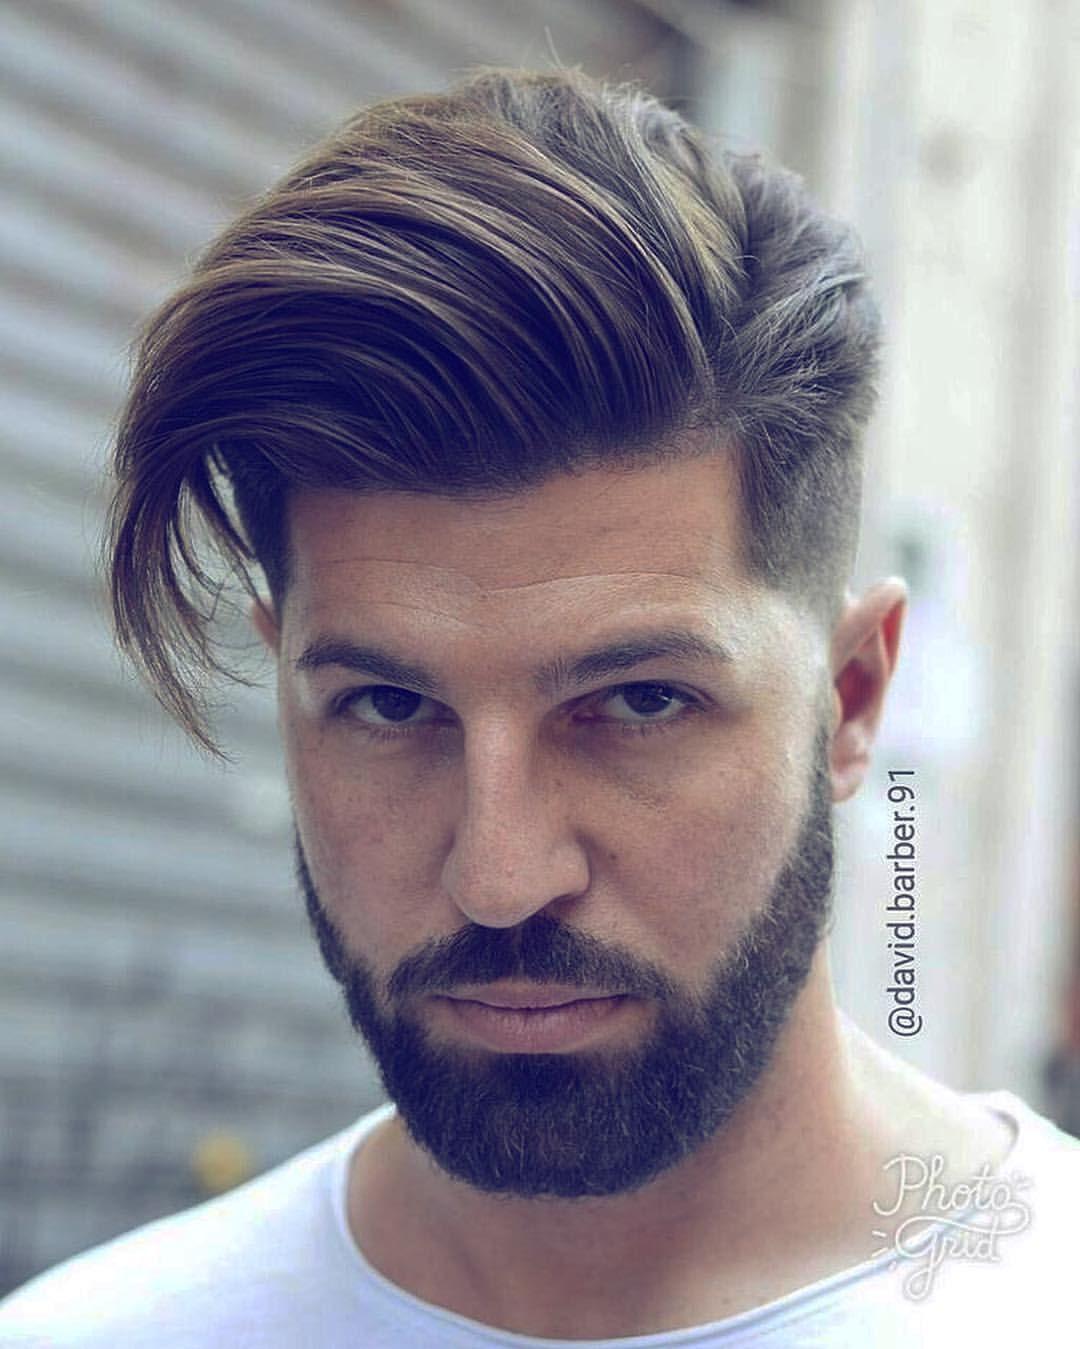 Nice Cutehairstylesmen Cutehairstylesmen Hair Followme Longhair Love Hairstyle Menshair Haircut Men Hair Color Gents Hair Style Men Haircut Styles